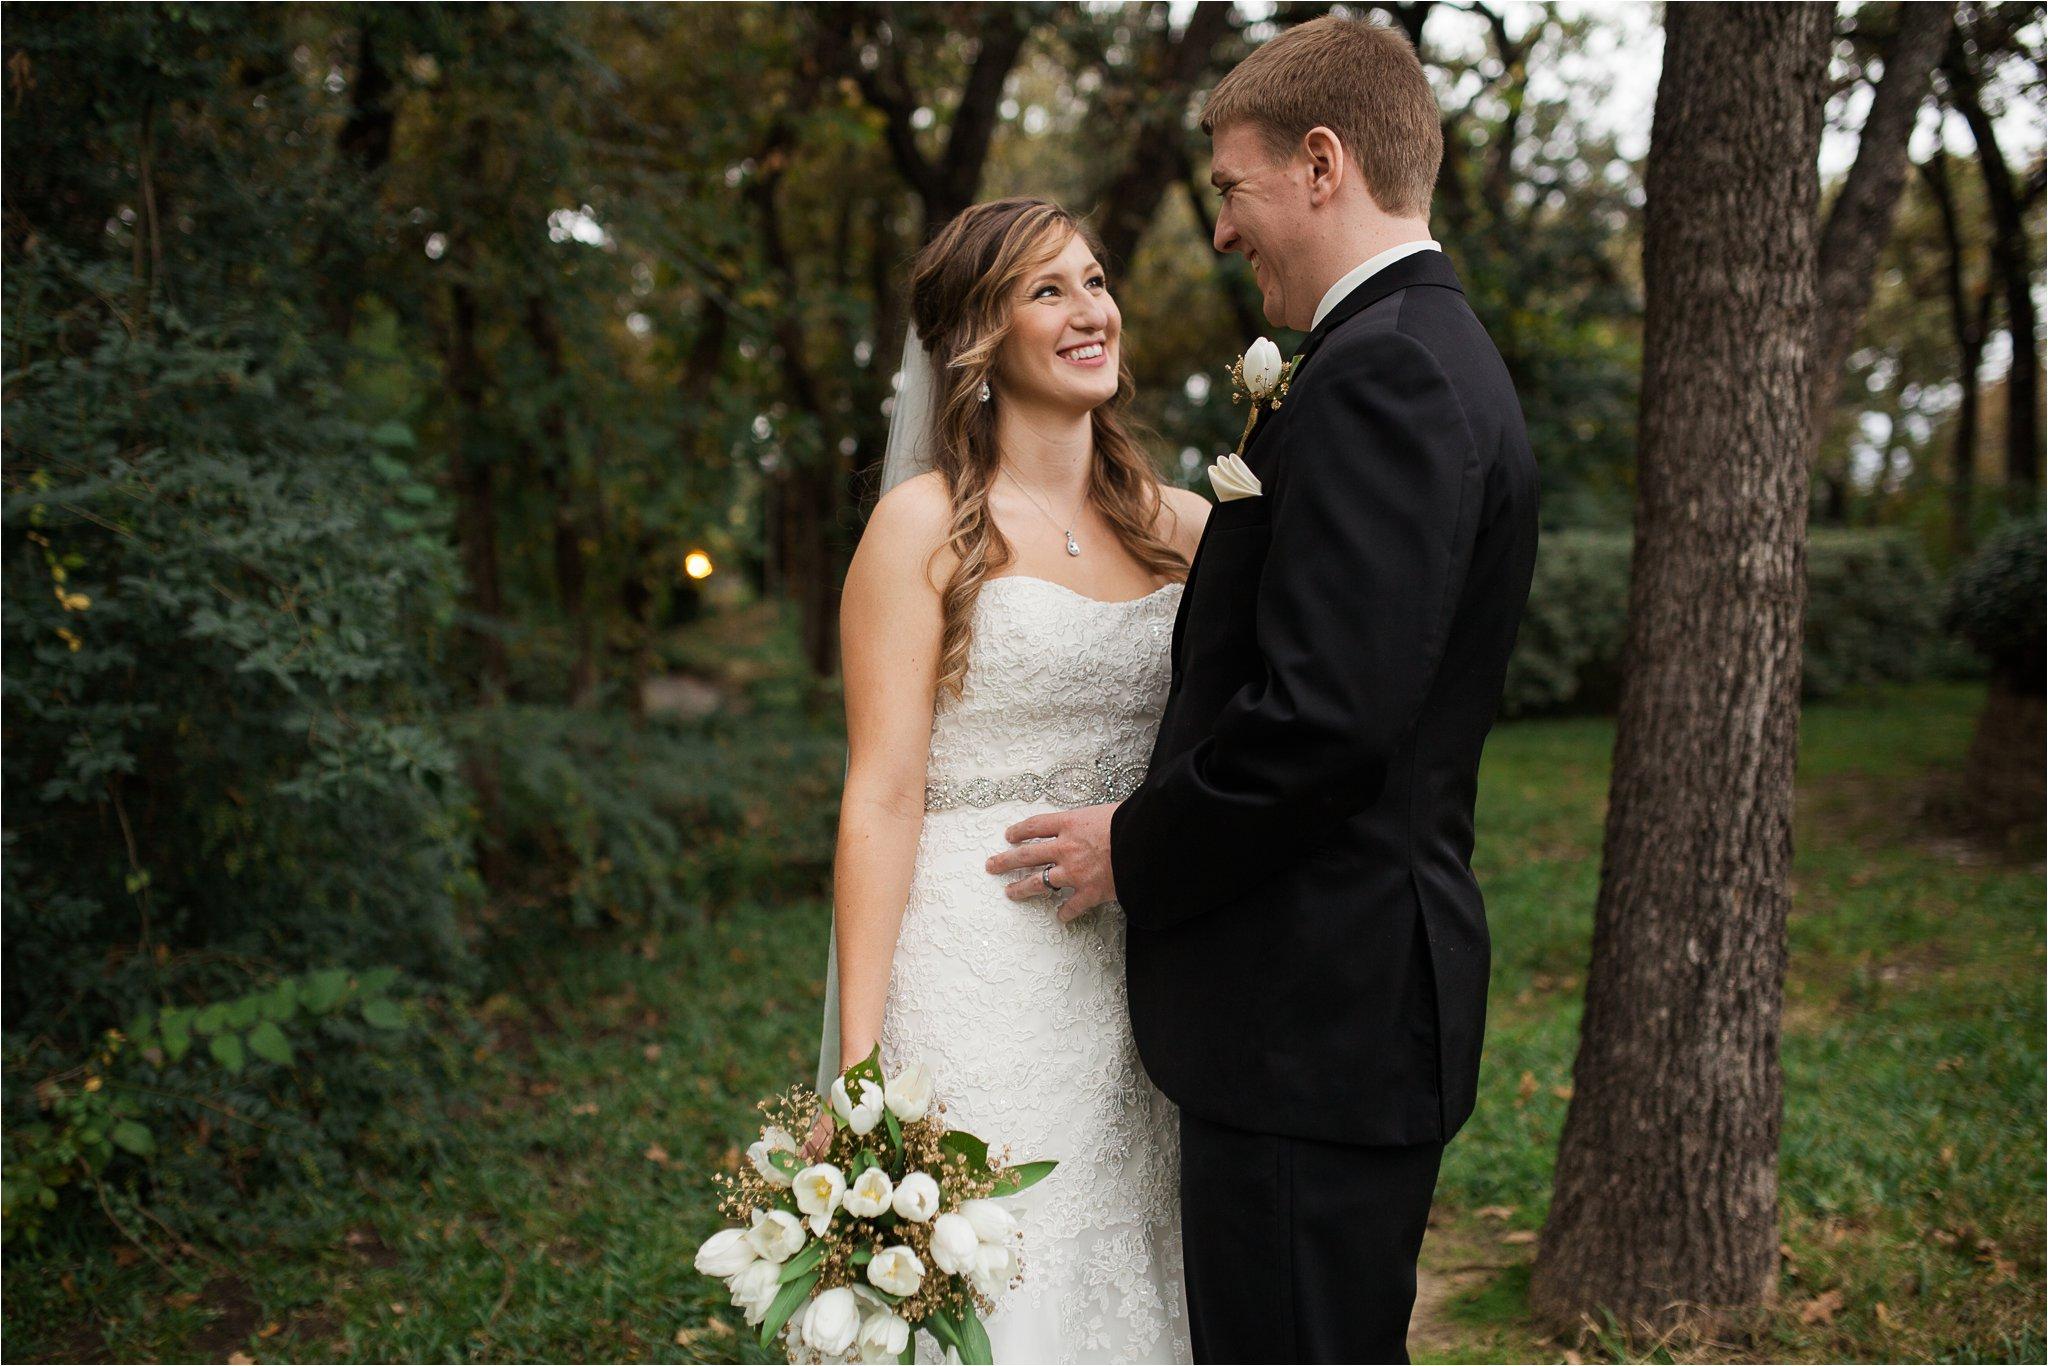 lunsford-wedding-663.jpg